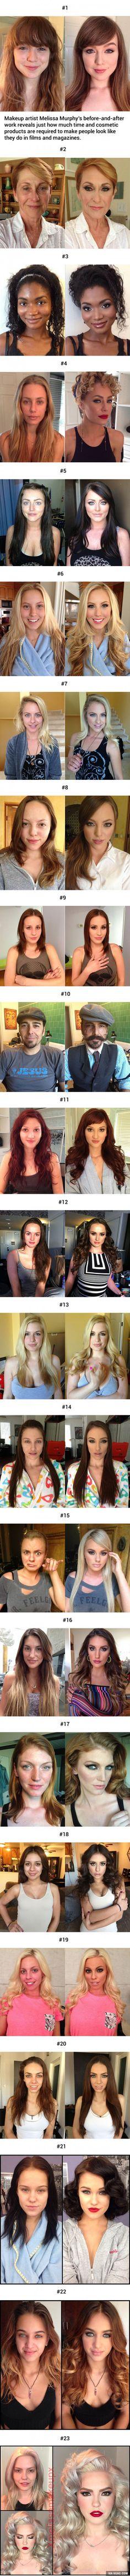 best skin care images on pinterest in beauty hacks beauty